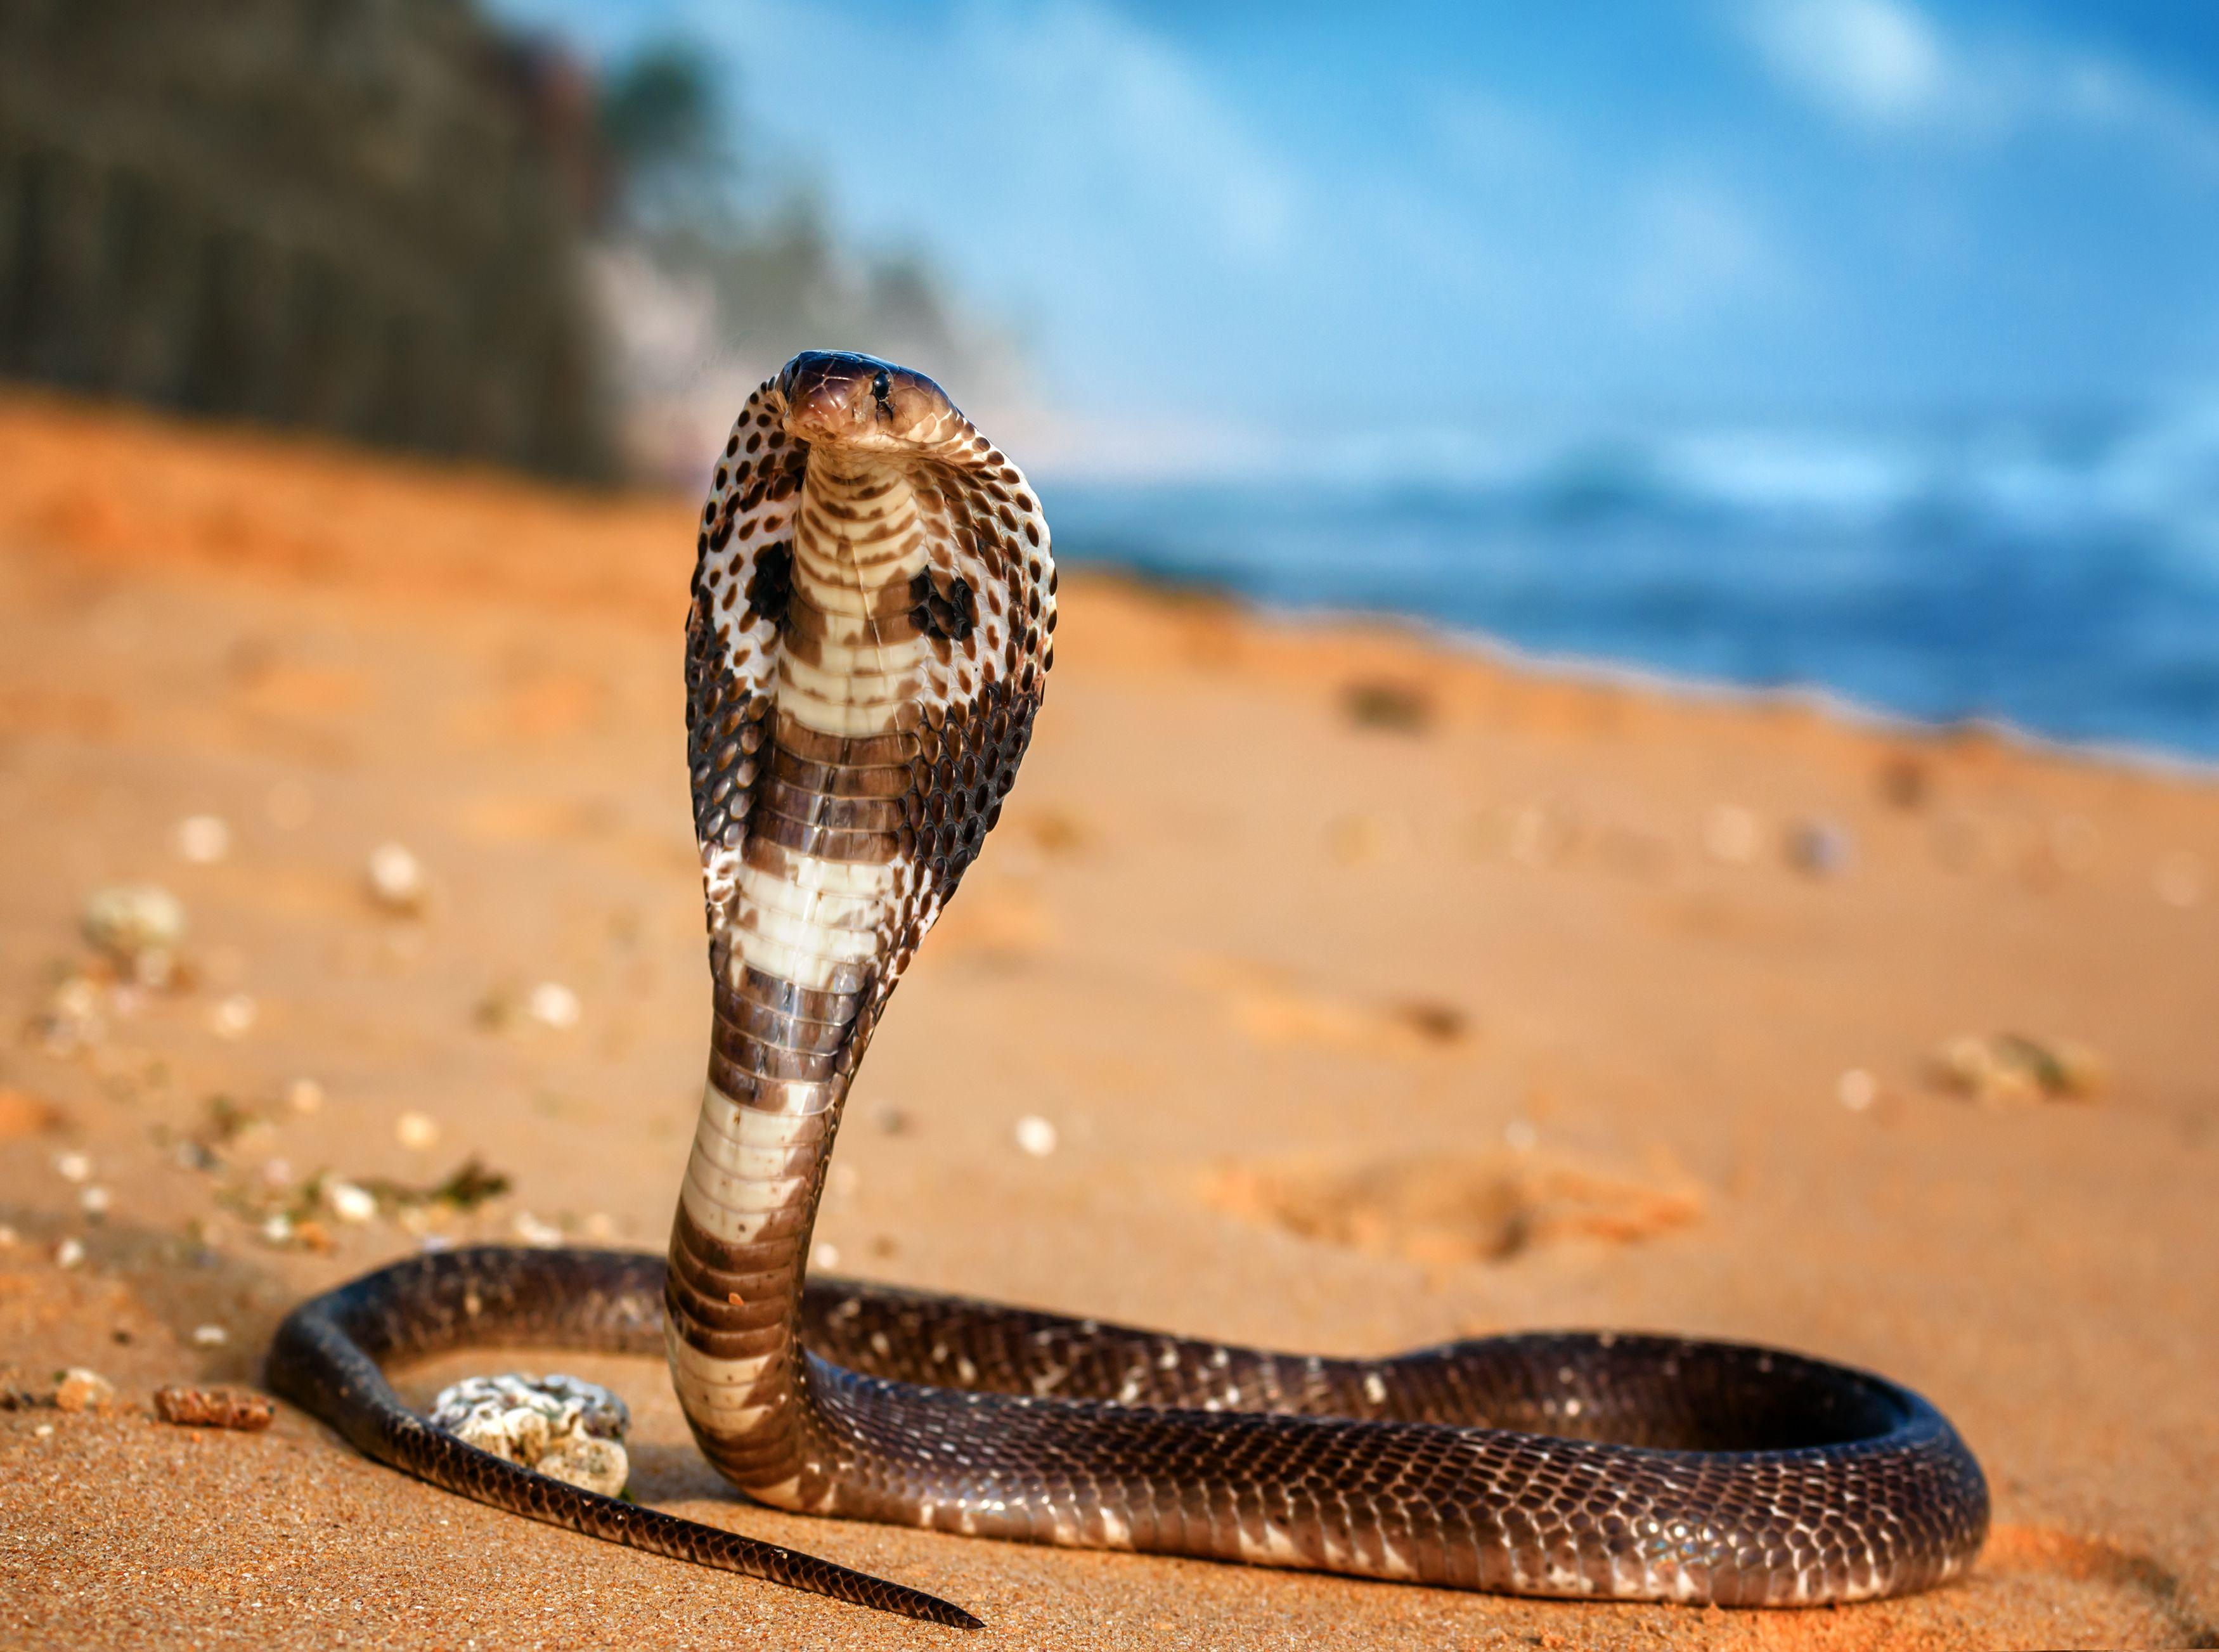 A king cobra.